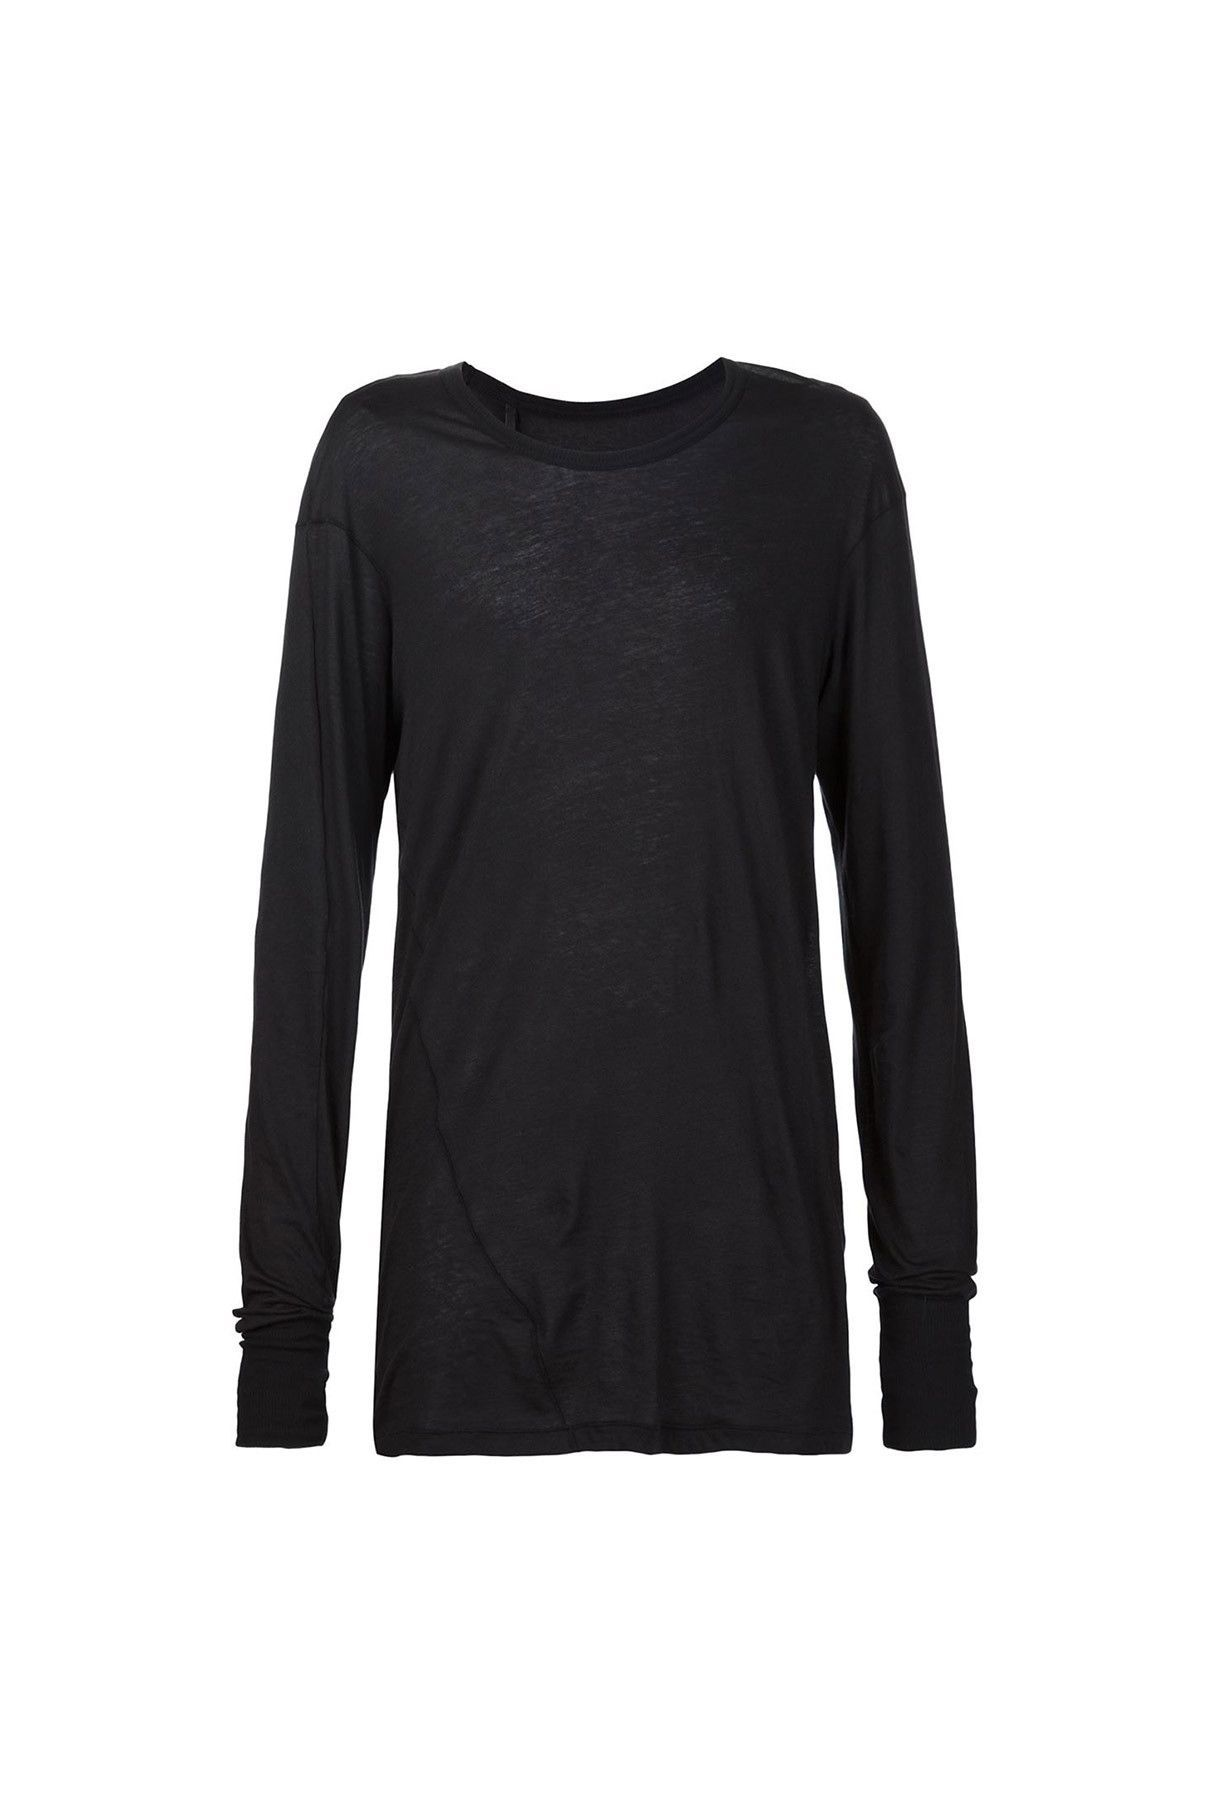 {11 By Boris Bidjan Saberi / 01 clothing / 04 knitwear / 01 t-shirt} Sheer Long Sleeve T-Shirt